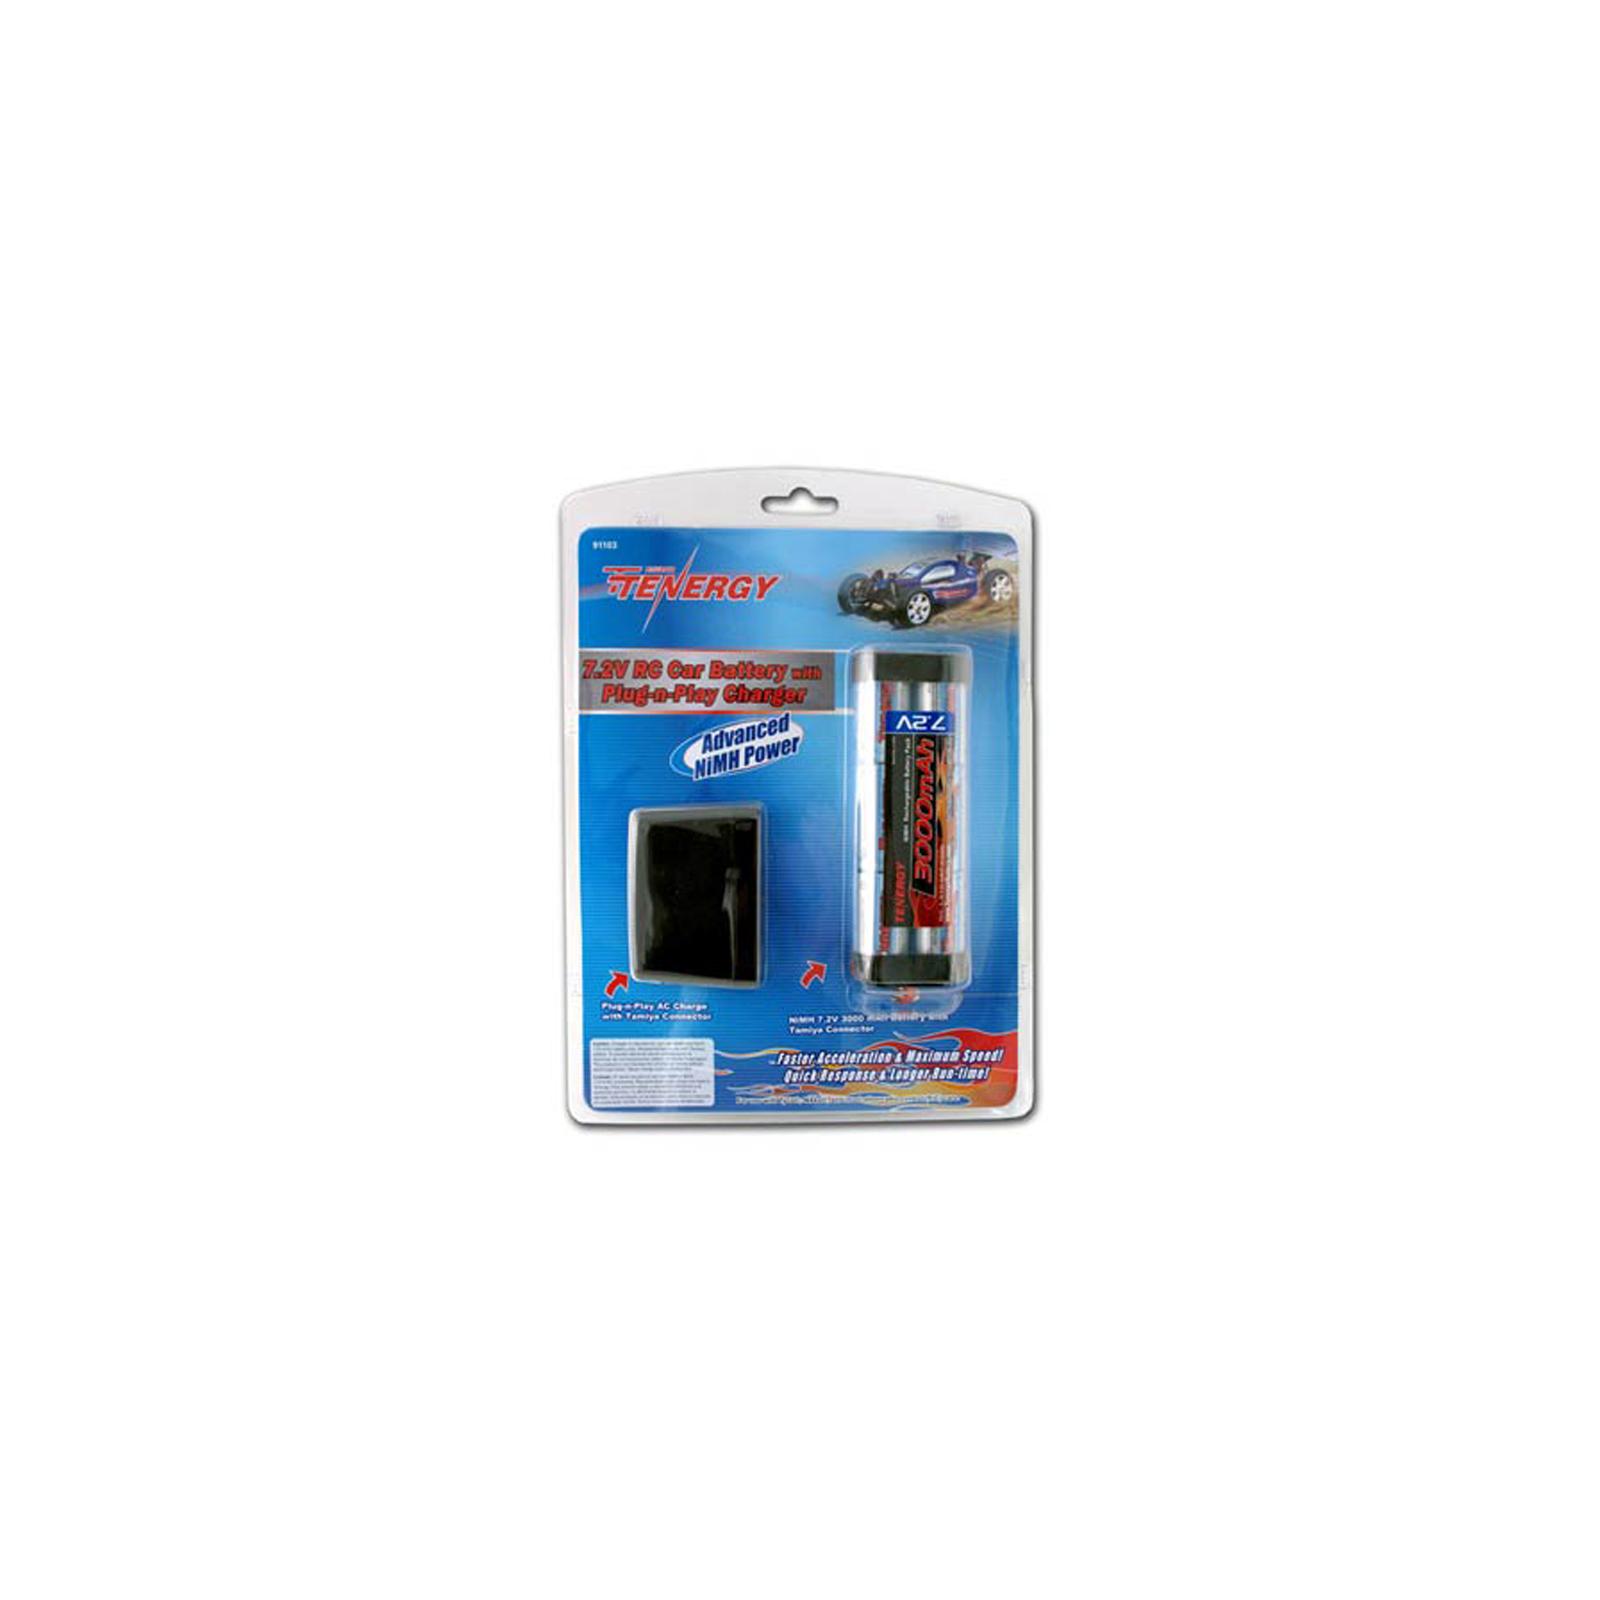 rc car battery pack and plug n play charger 7 2v 3000mah nimh ebay. Black Bedroom Furniture Sets. Home Design Ideas